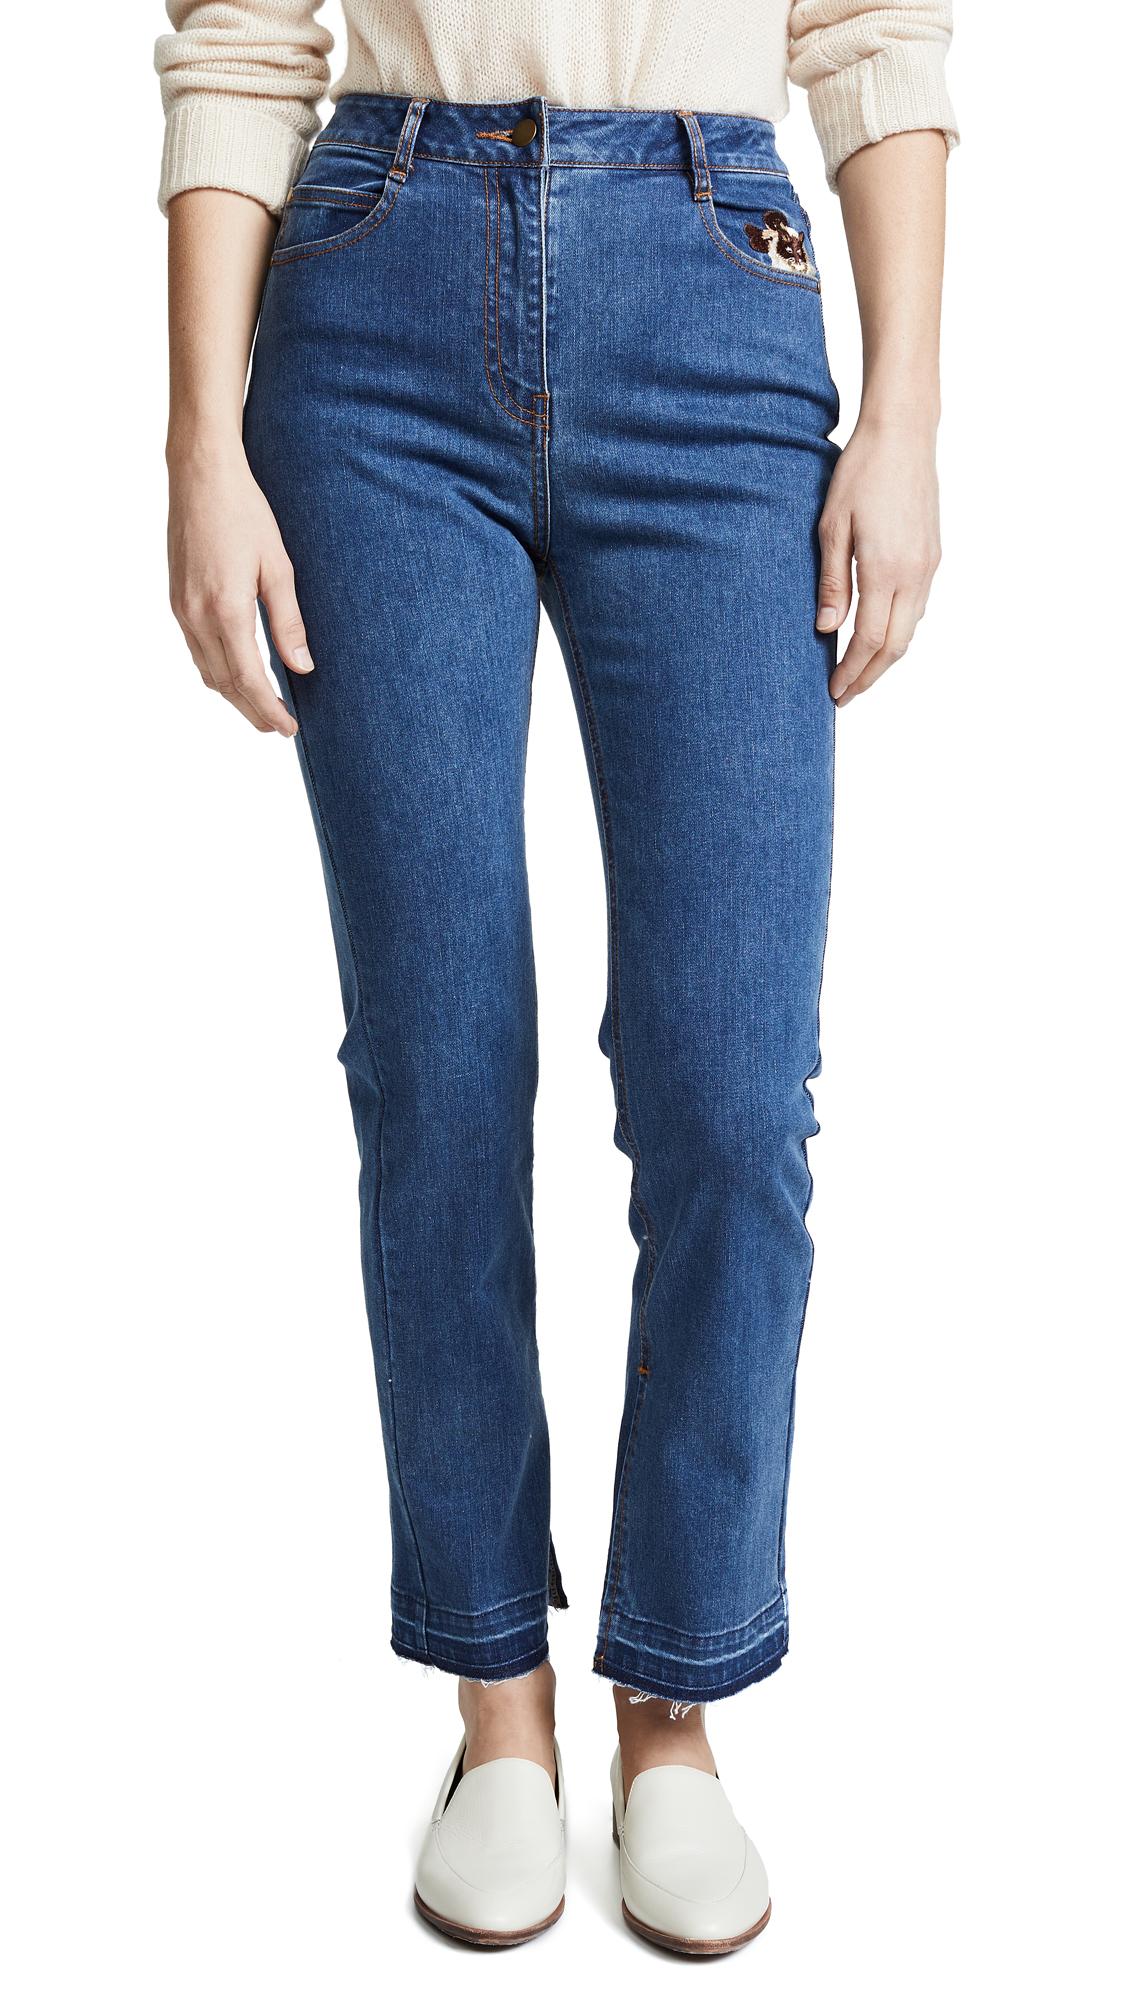 Farniente Jeans, Denim